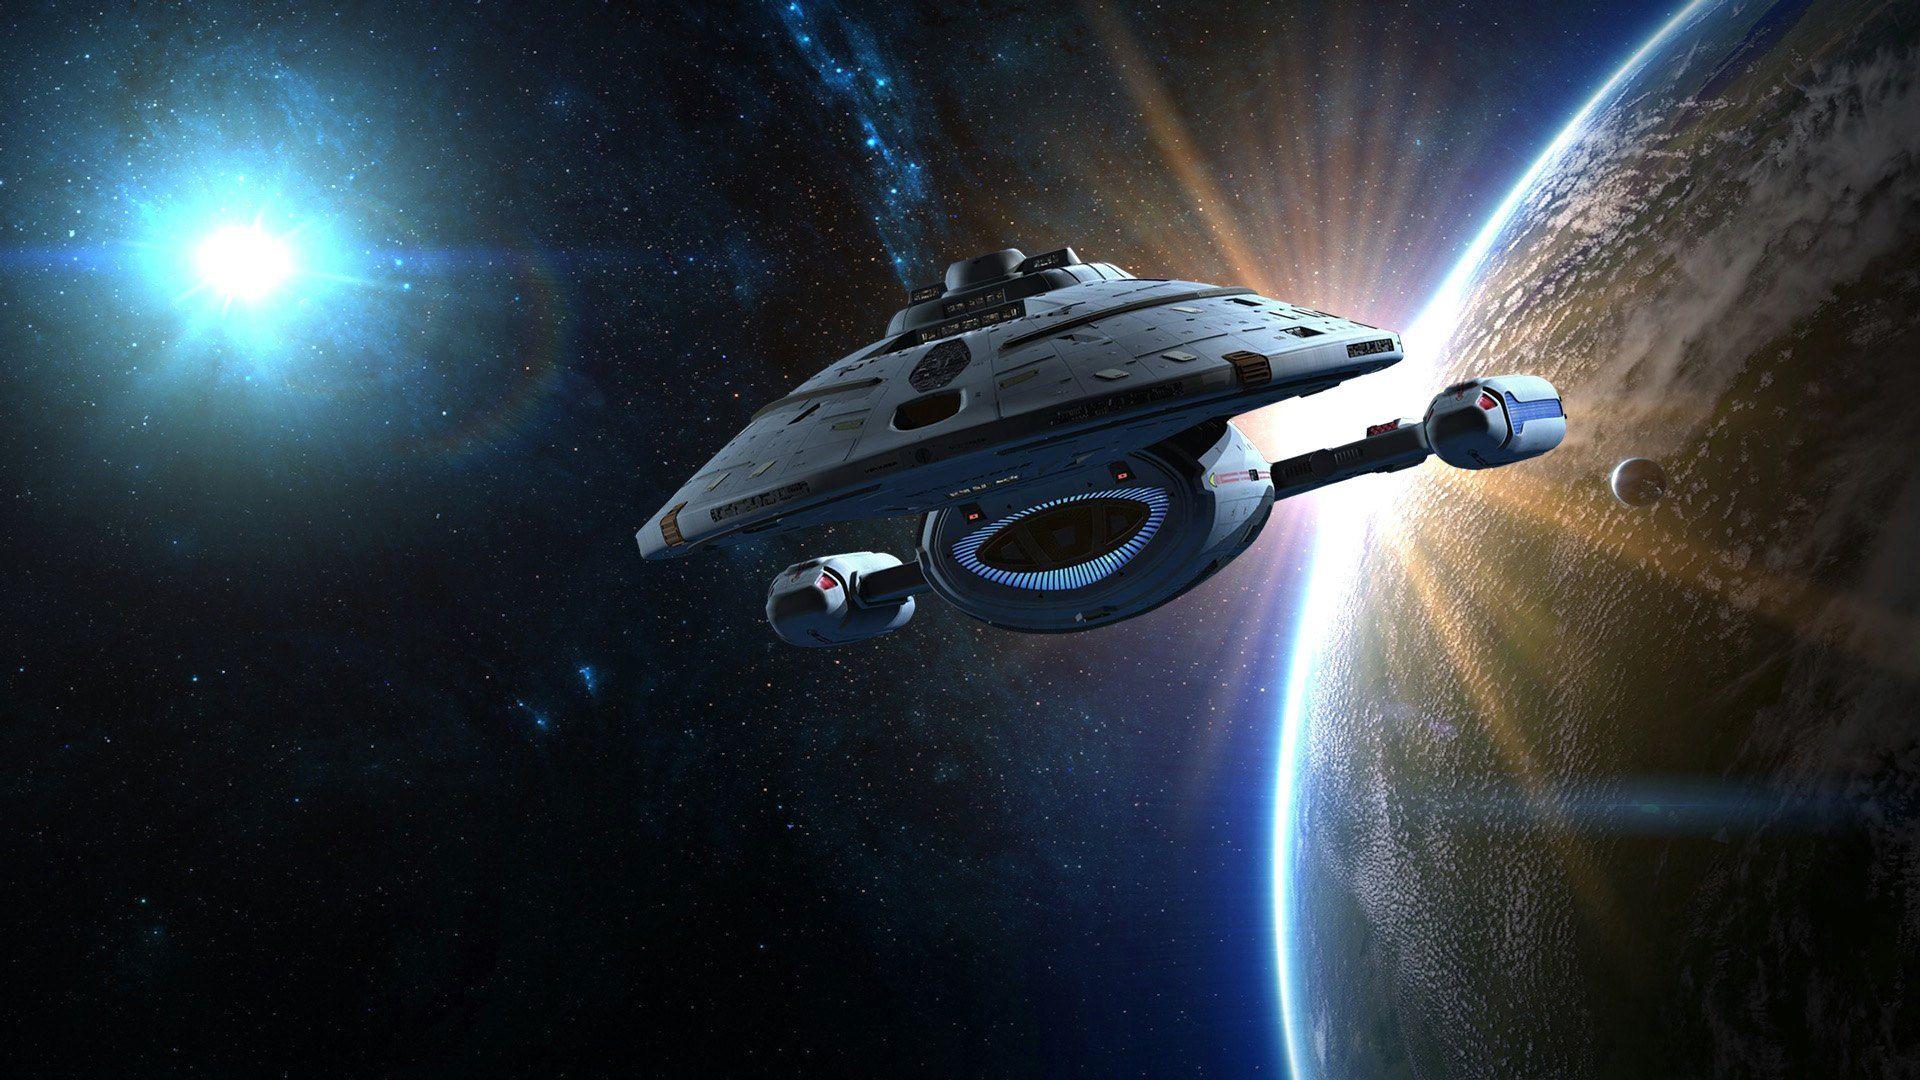 Pin By Justin Day On Sci Fi Star Trek Wallpaper Star Trek Voyager Star Trek Starships